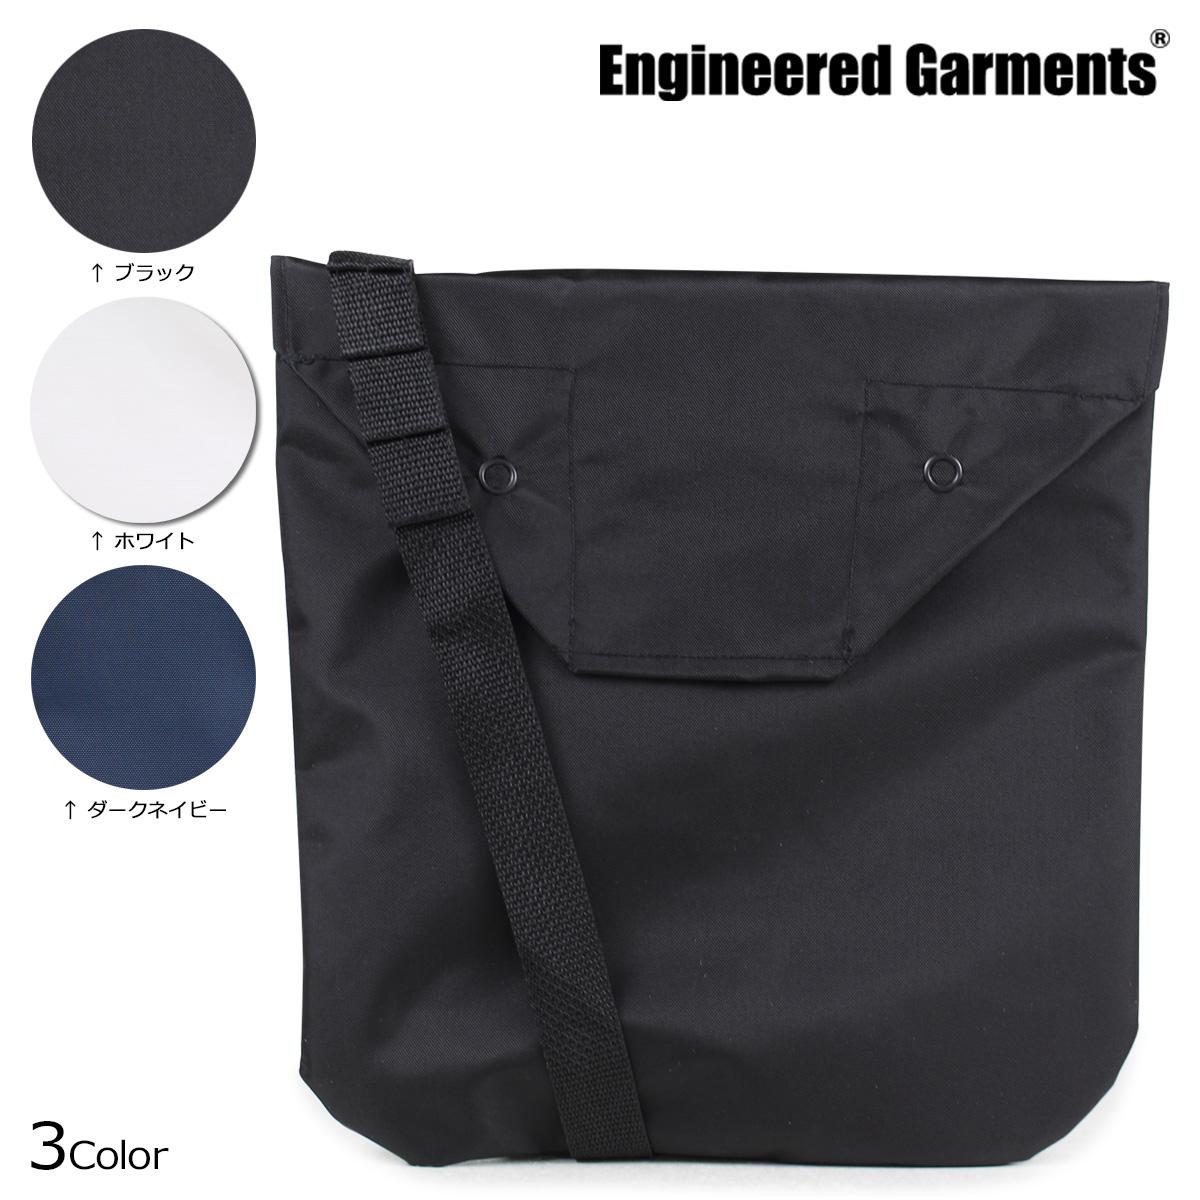 ENGINEERED GARMENTS SHOULDER POUCH エンジニアドガーメンツ バッグ メンズ レディース ショルダーバッグ ブラック ホワイト ネイビー